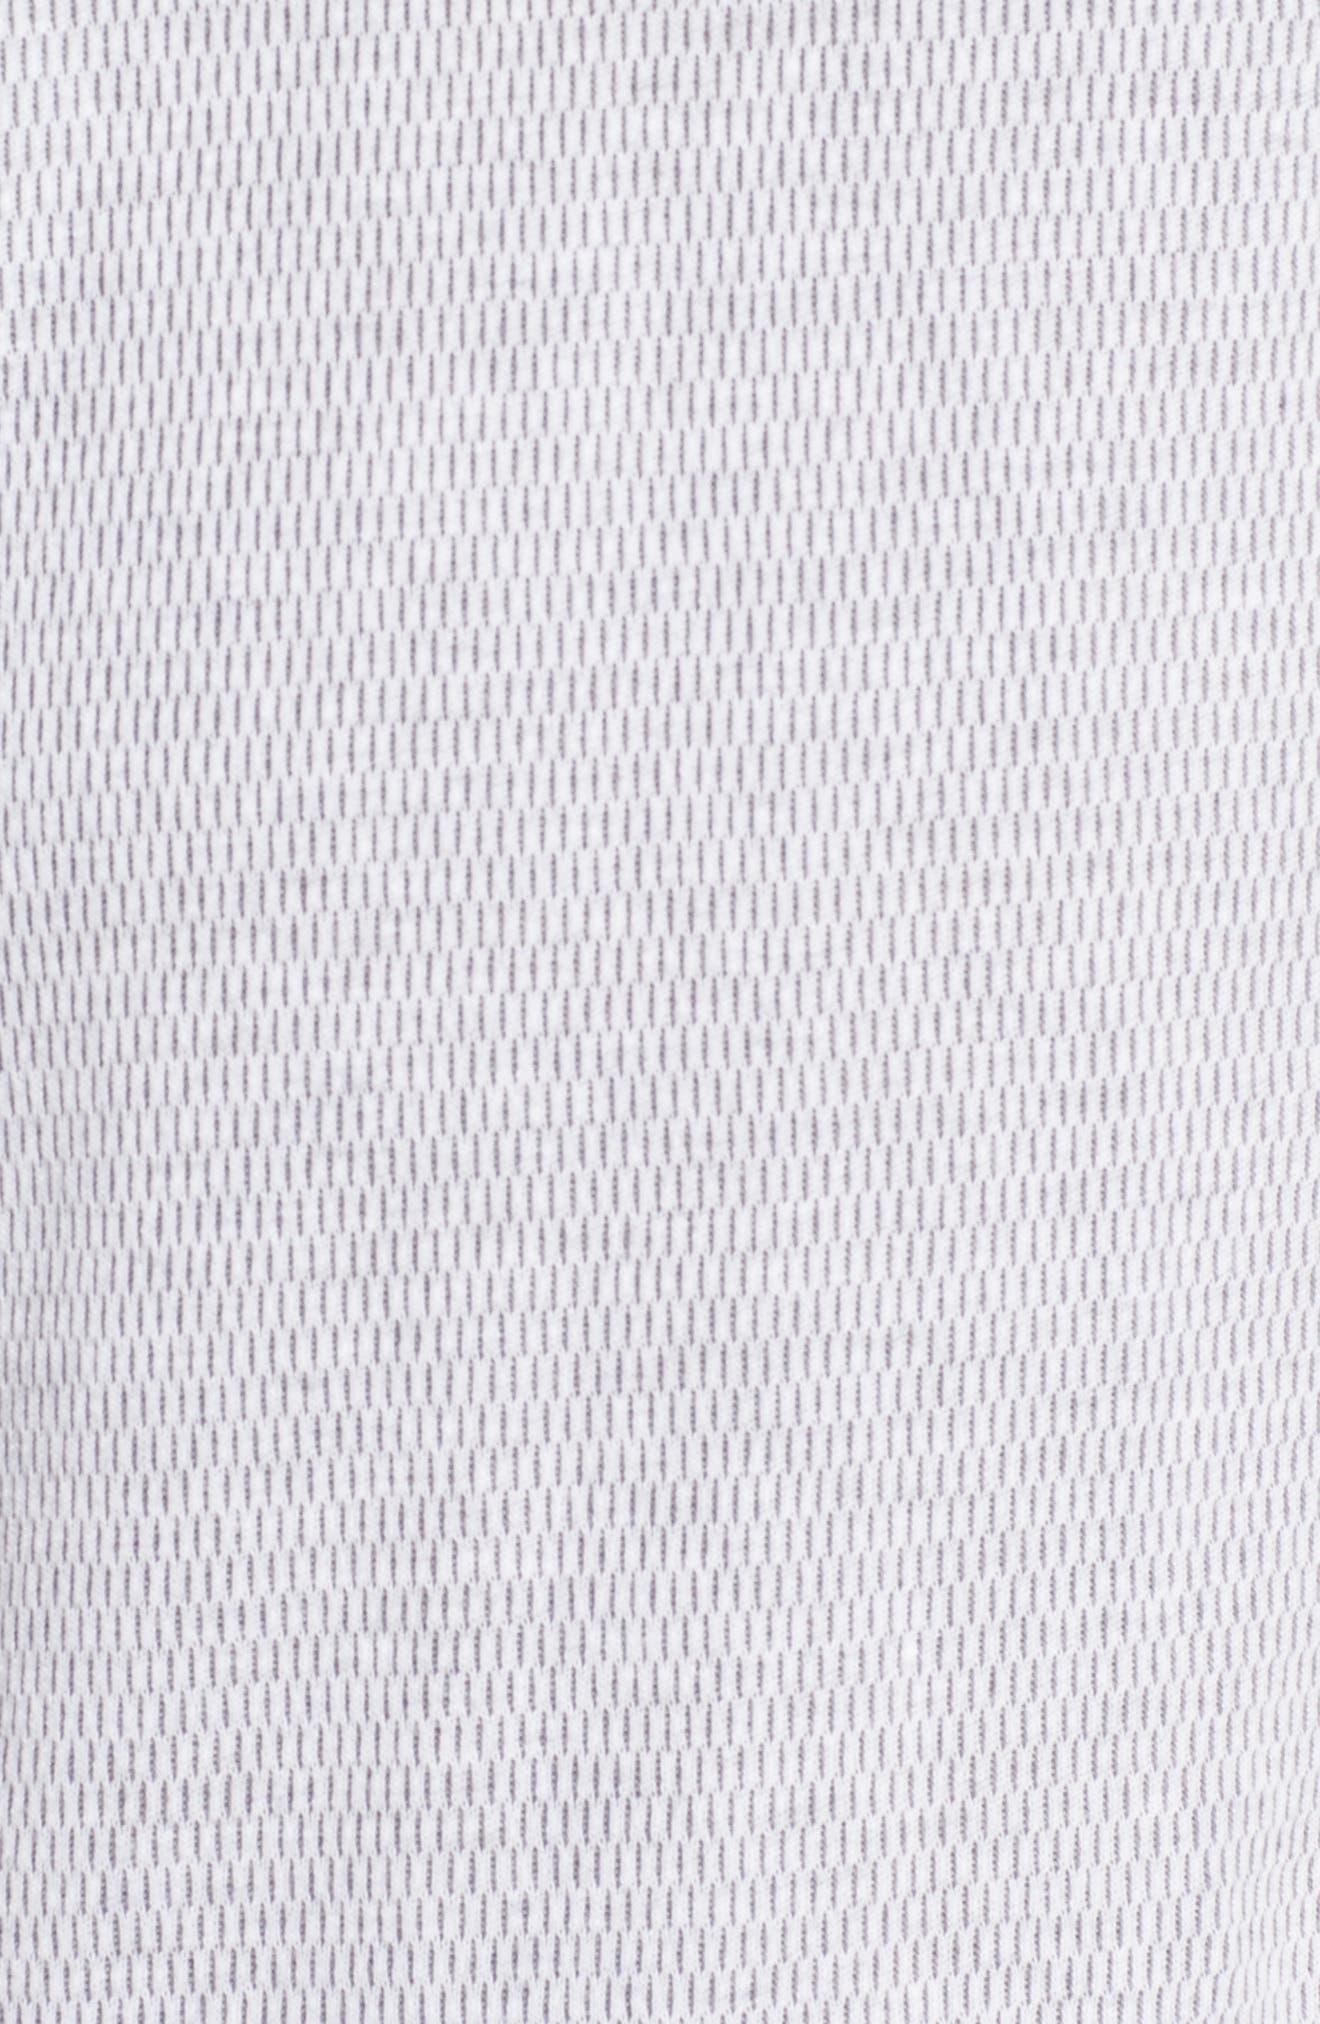 Notch Neck Thermal T-Shirt,                             Alternate thumbnail 31, color,